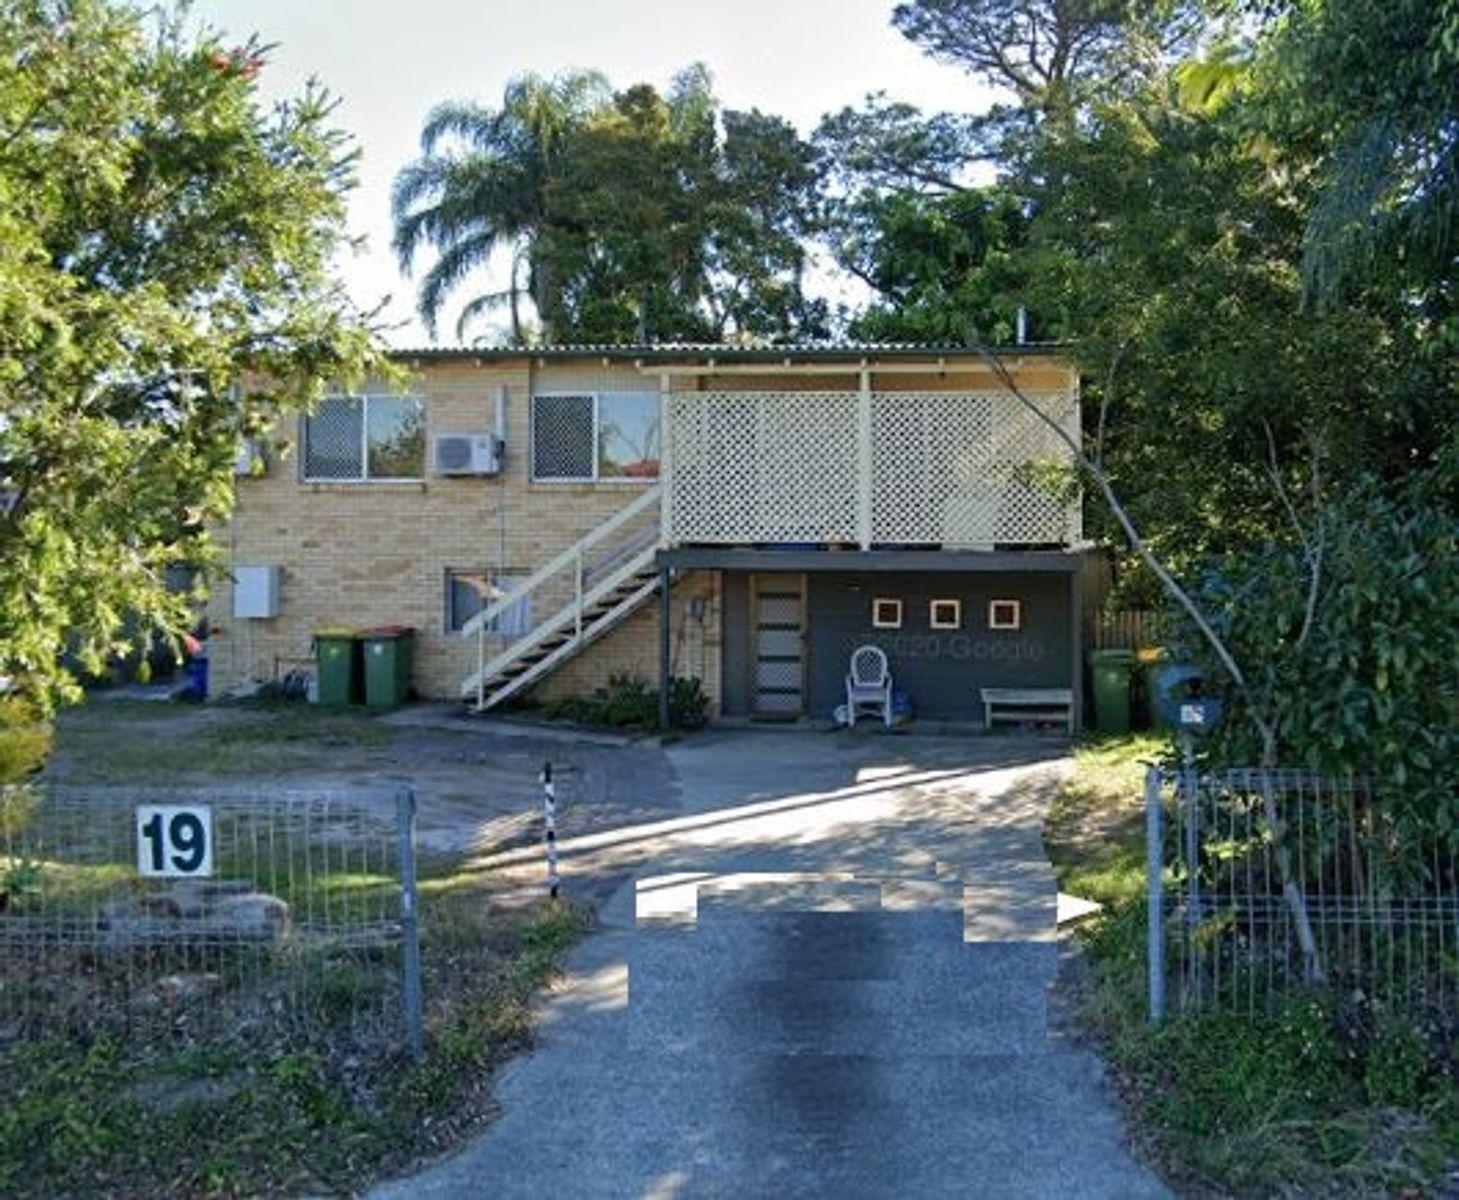 19 Ney Road, Capalaba, QLD 4157